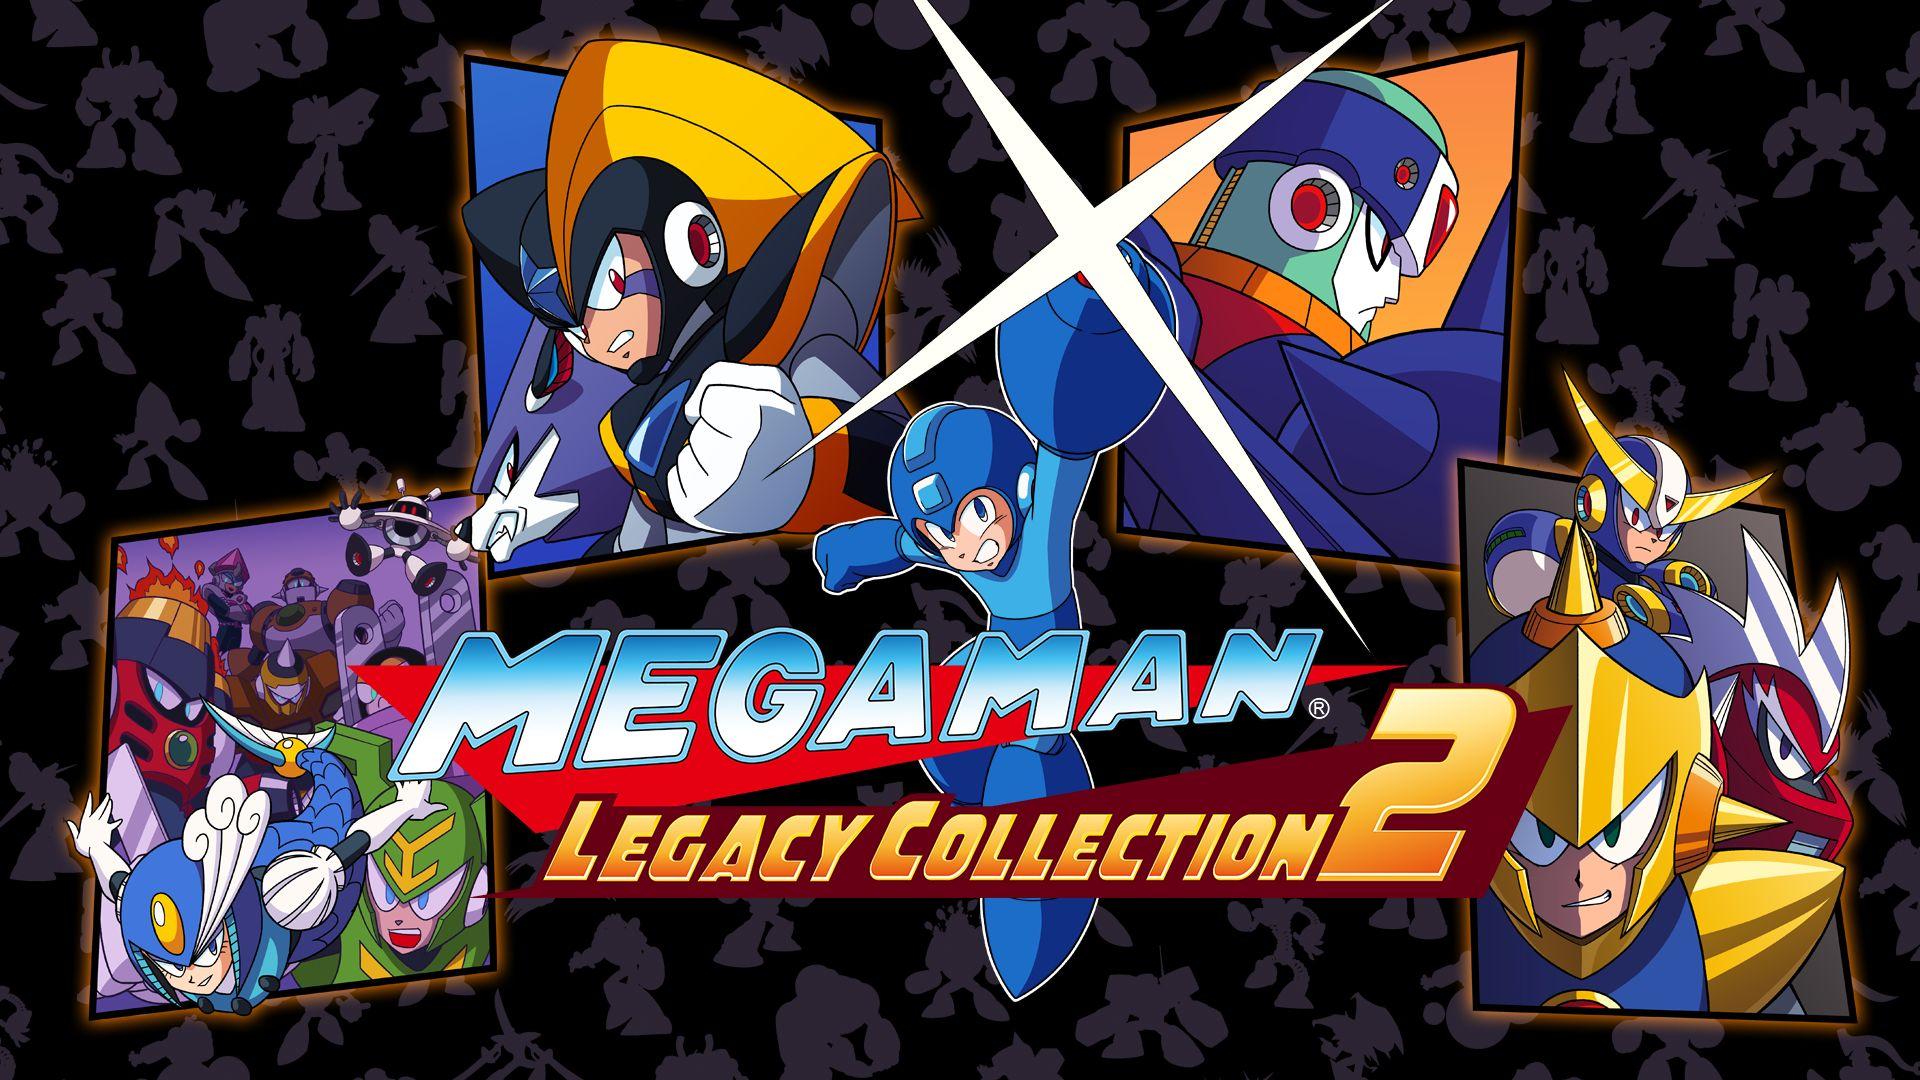 http://nintendoeverything.com/wp-content/uploads/mega-man-legacy-collection-2-1.jpg